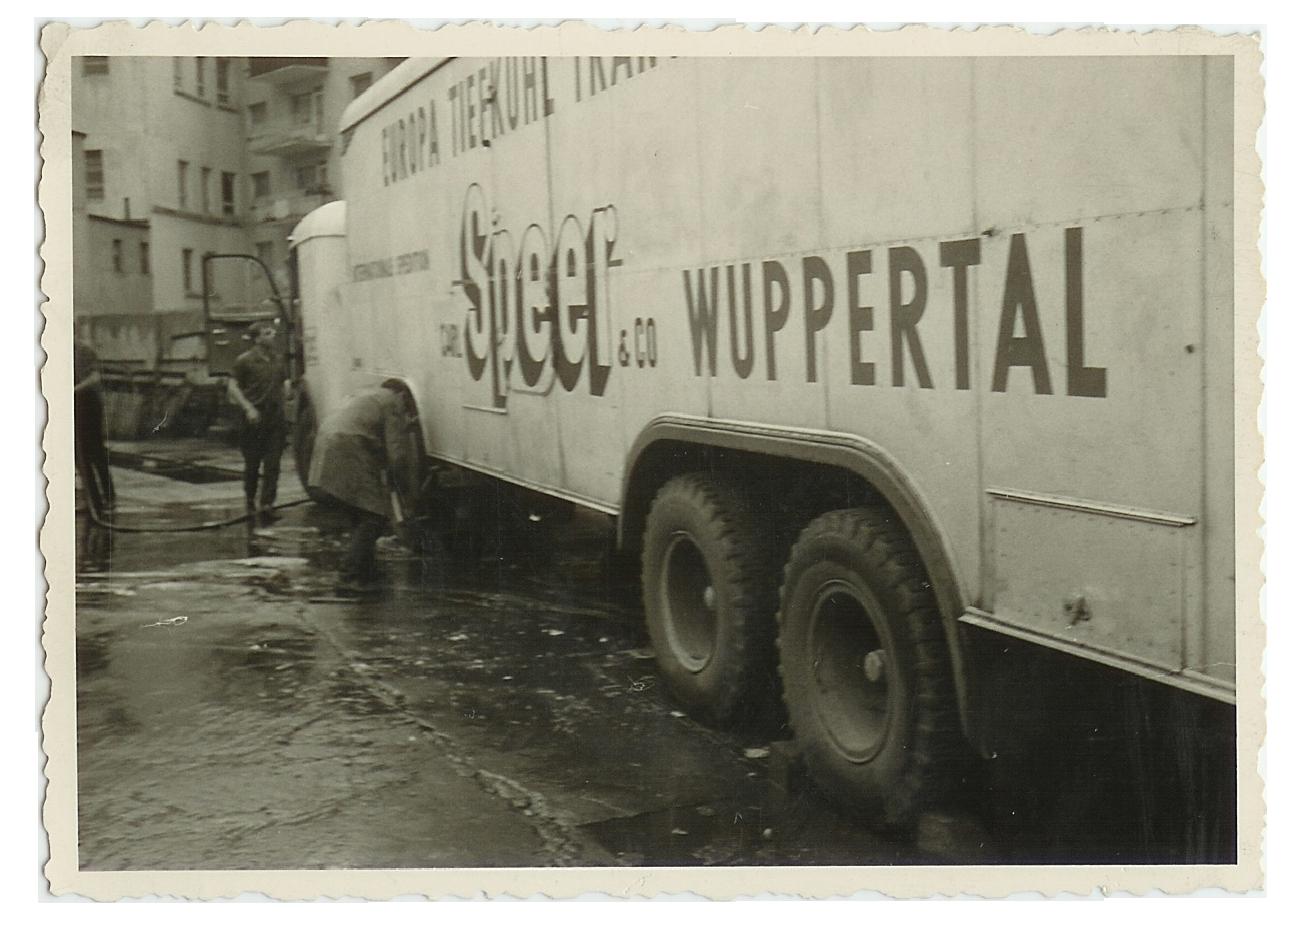 Carl Speer, Wuppertal